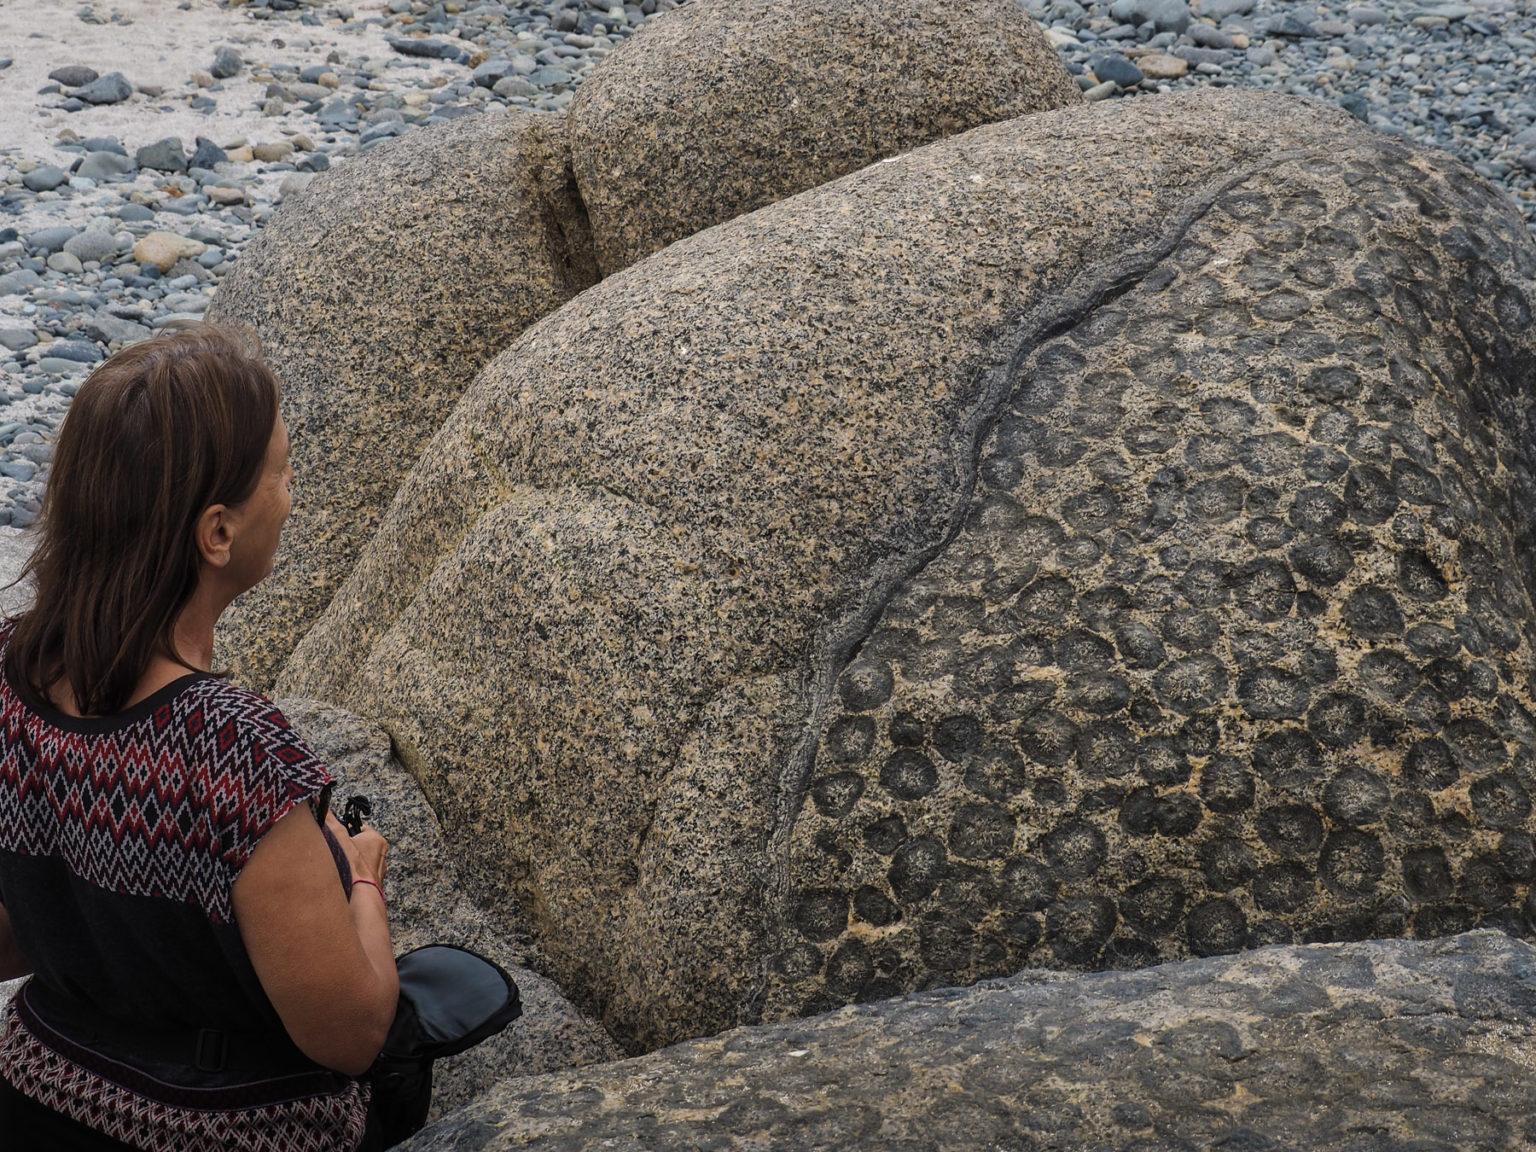 Leopardenfelsen am Strand